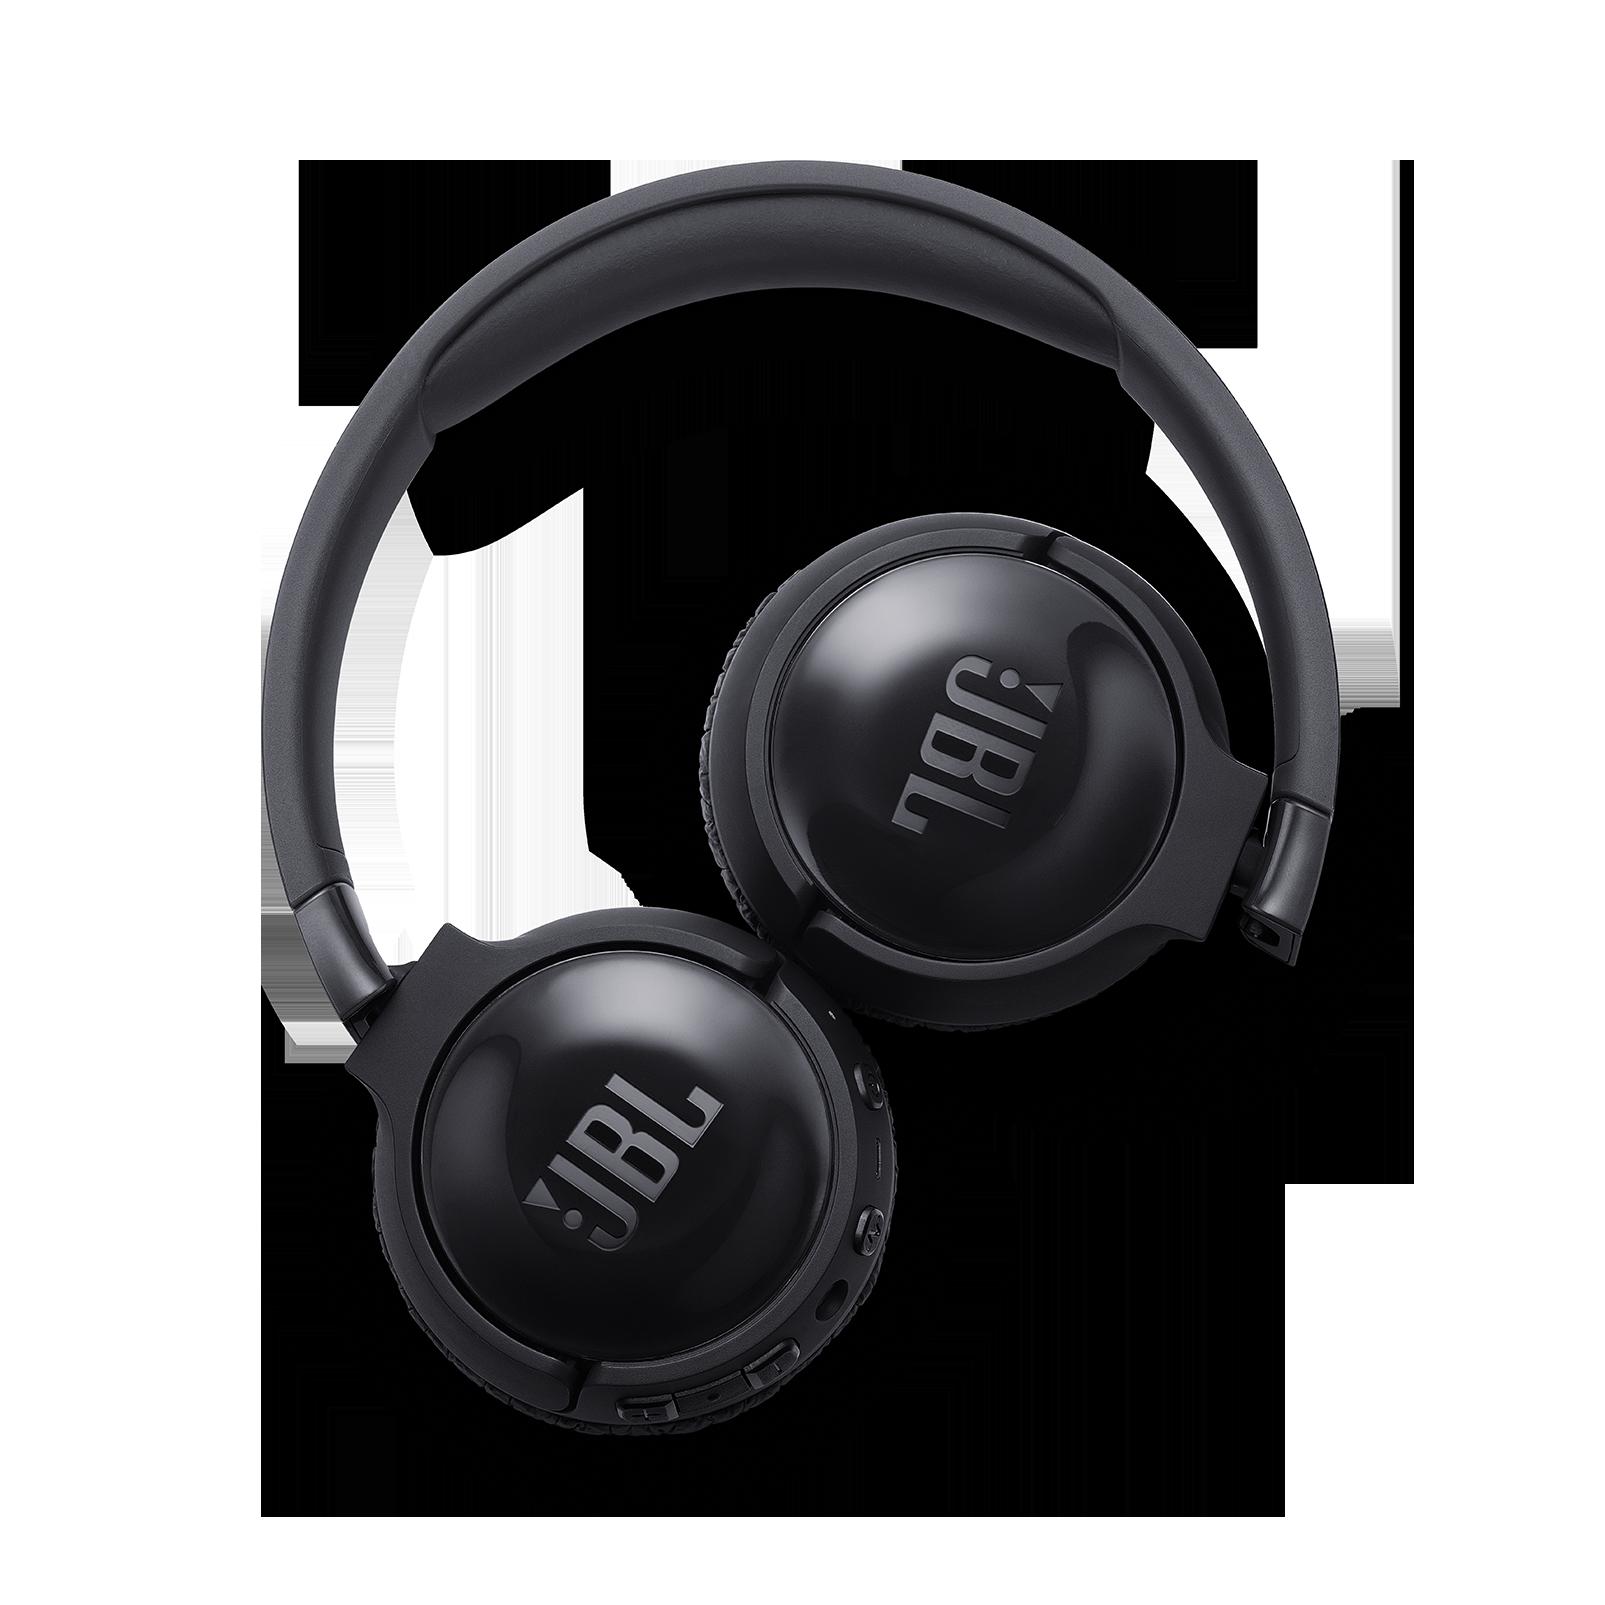 JBL TUNE 600BTNC - Black - Wireless, on-ear, active noise-cancelling headphones. - Detailshot 4